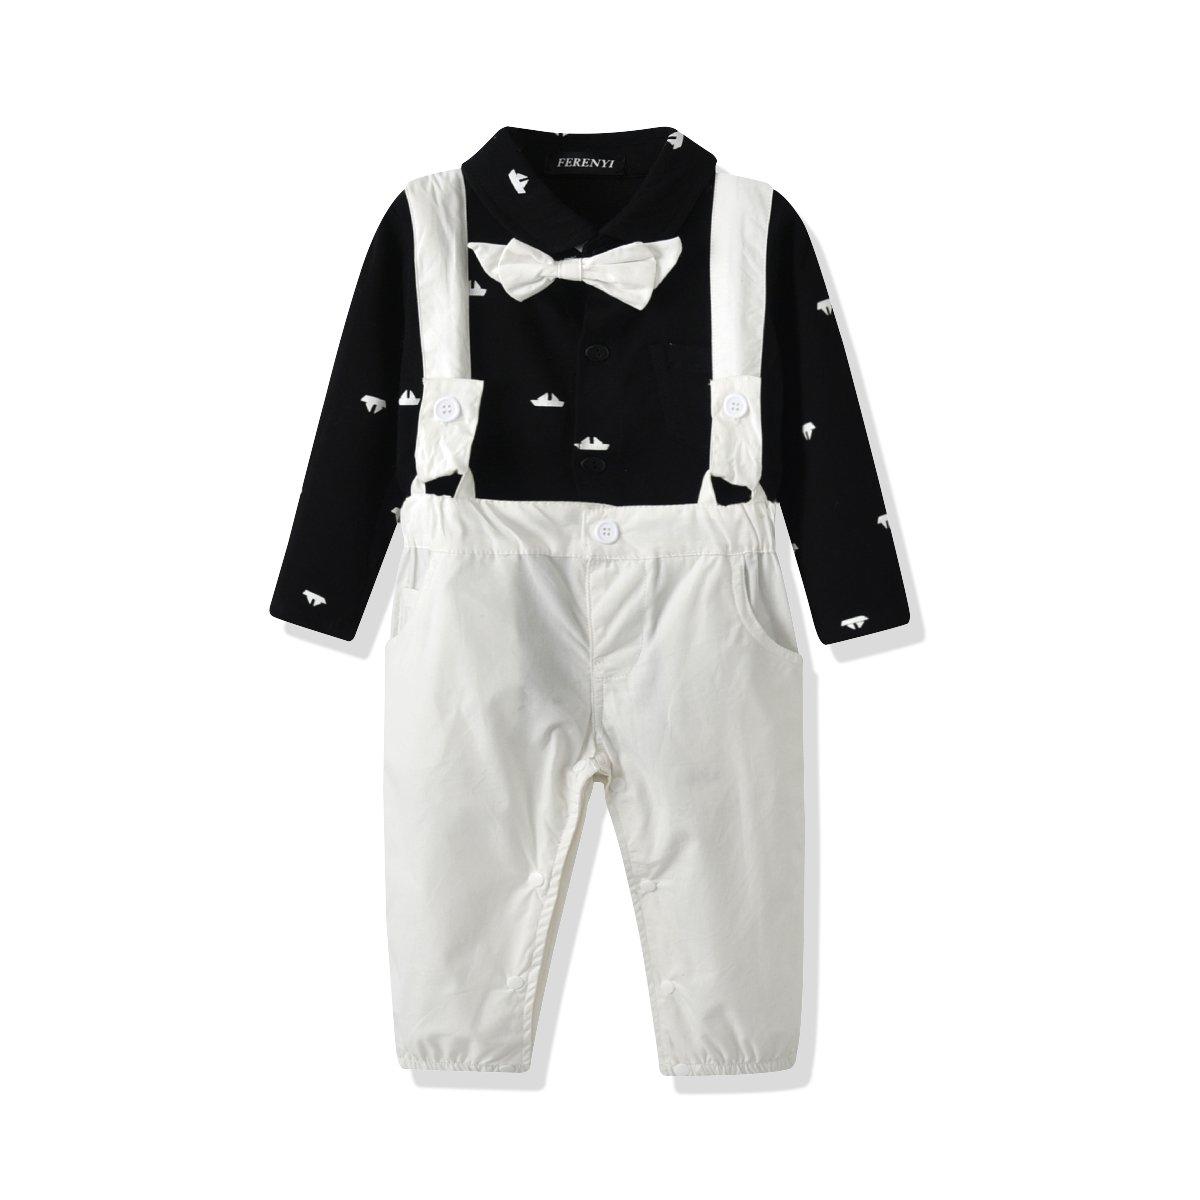 431416c2c FERENYI US Baby Boys Bowtie Gentleman Romper Jumpsuit Overalls Rompers (0-6  Months,